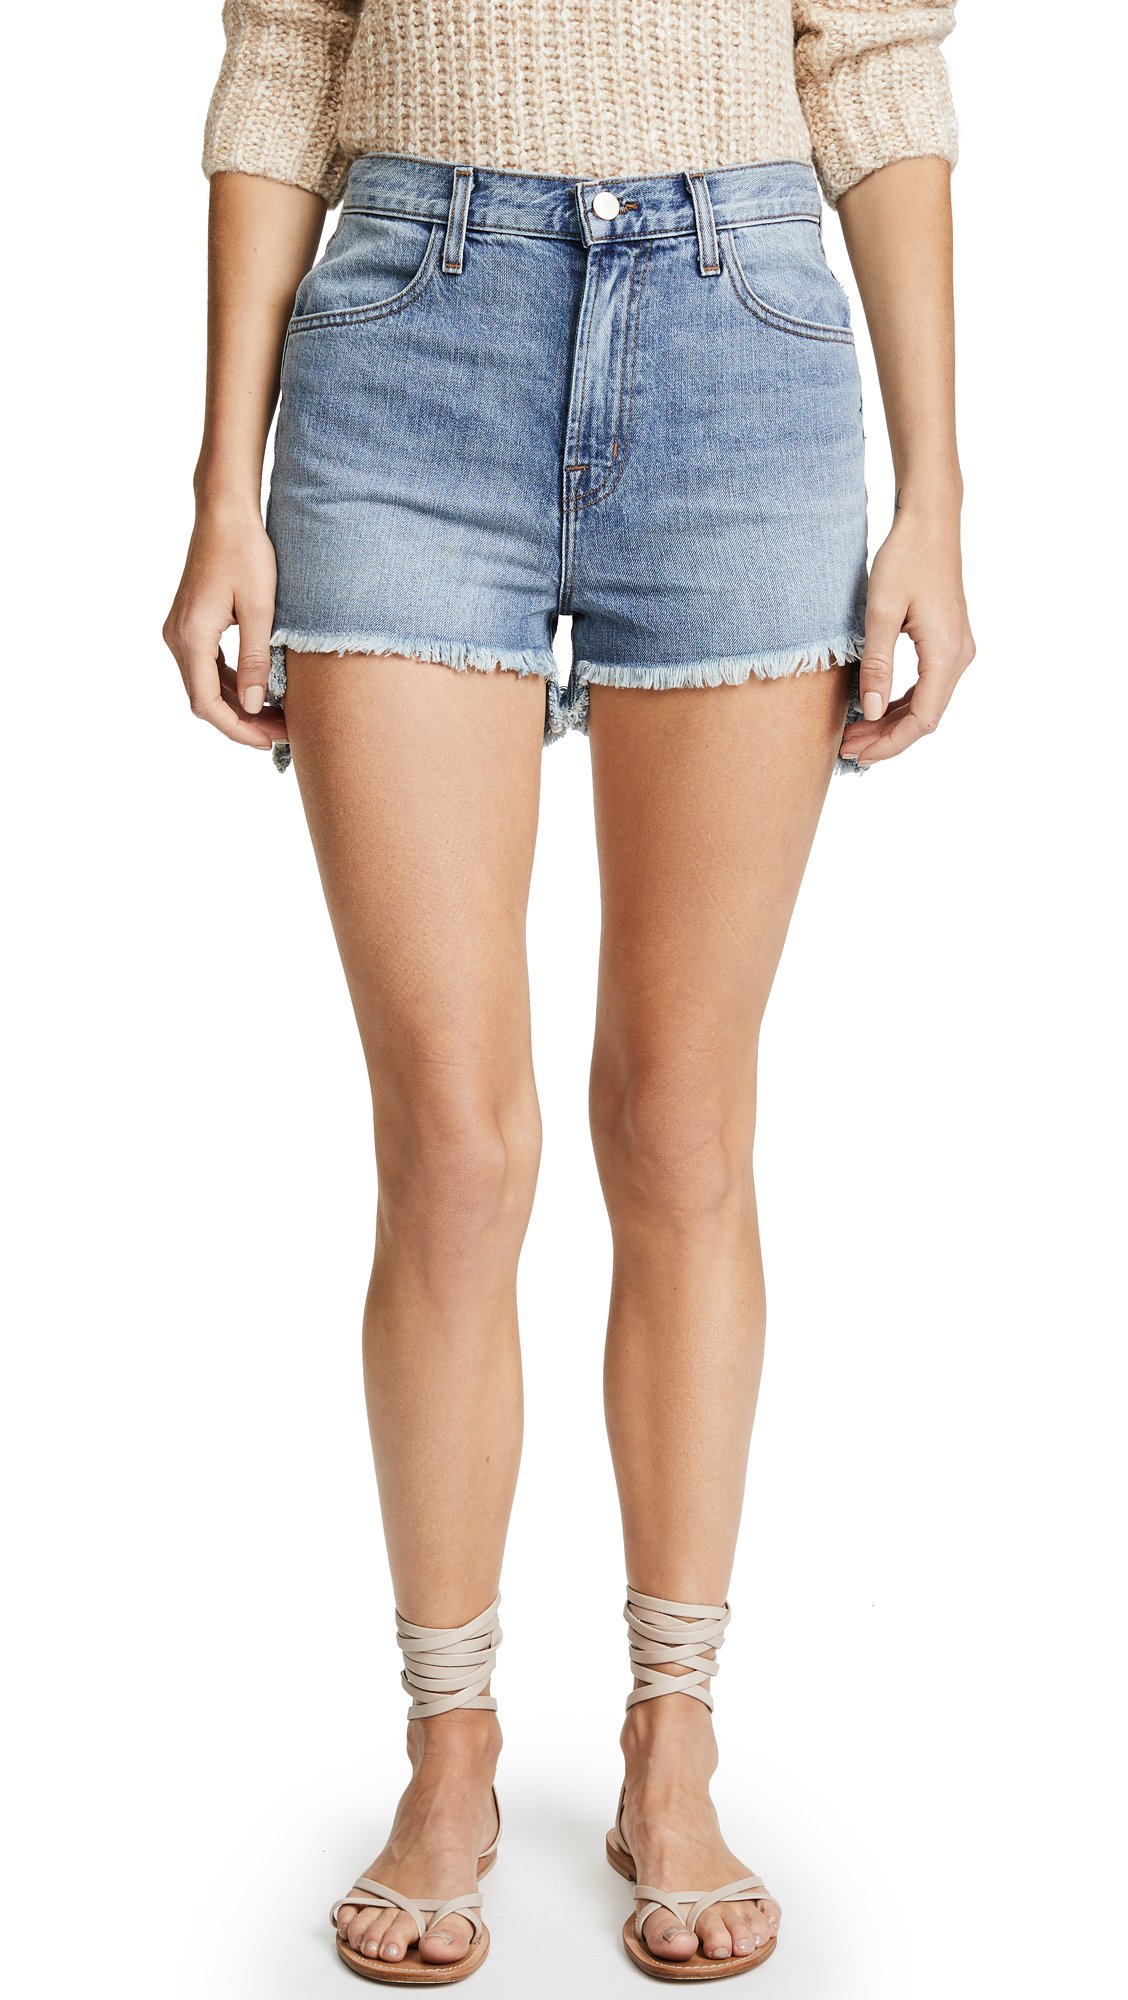 J Brand Women's Joan High Rise Shorts, Hydra, 31